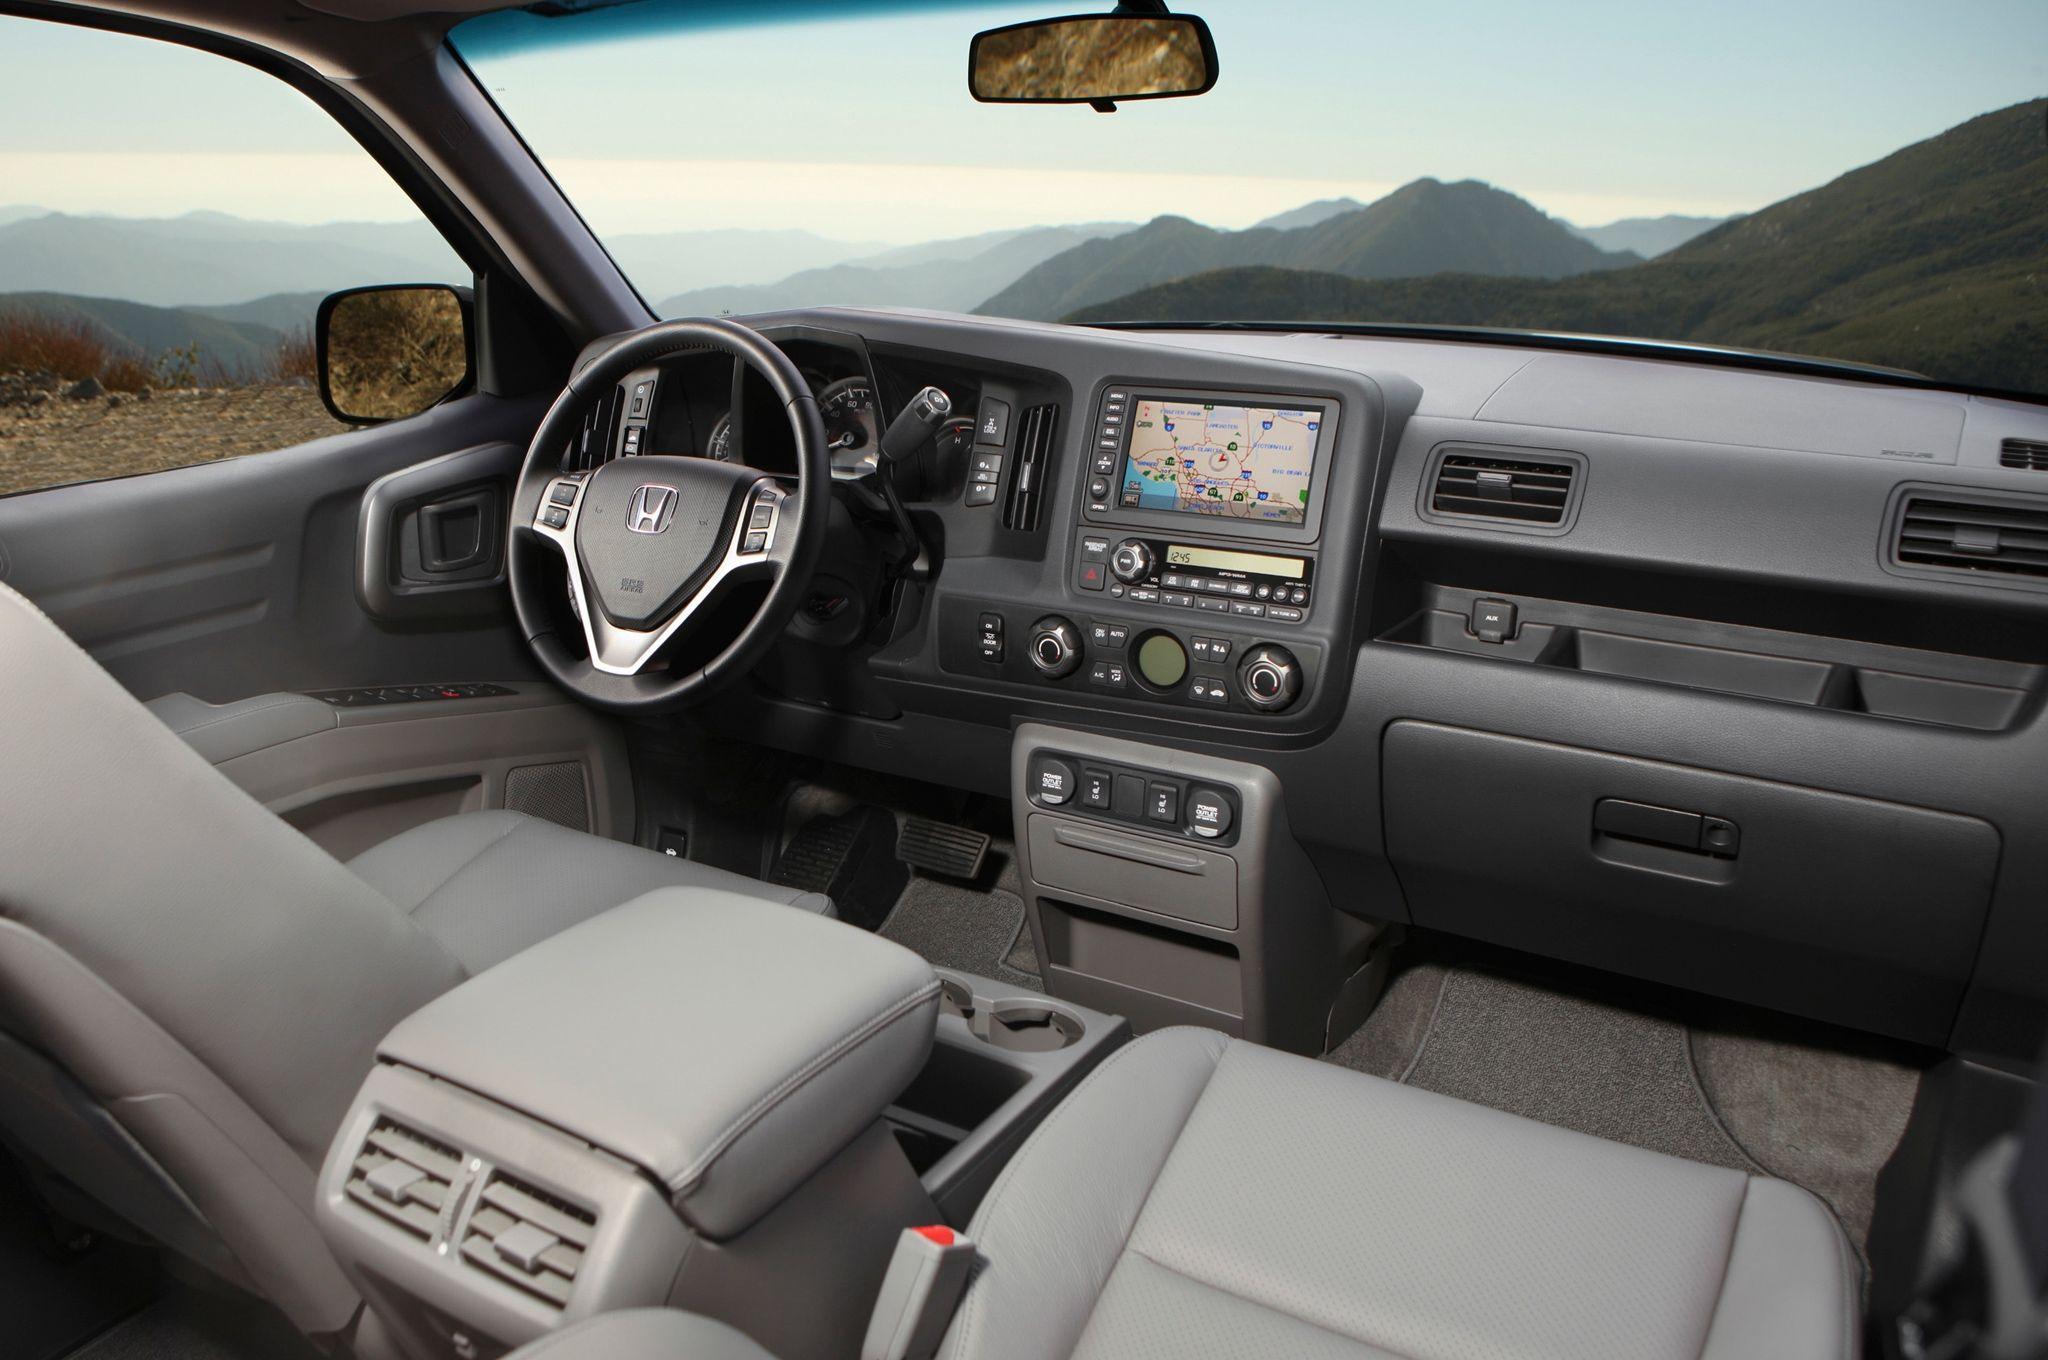 Honda Toms River 1000 Images About 2016 Hondas On Pinterest Honda Civic Coupe